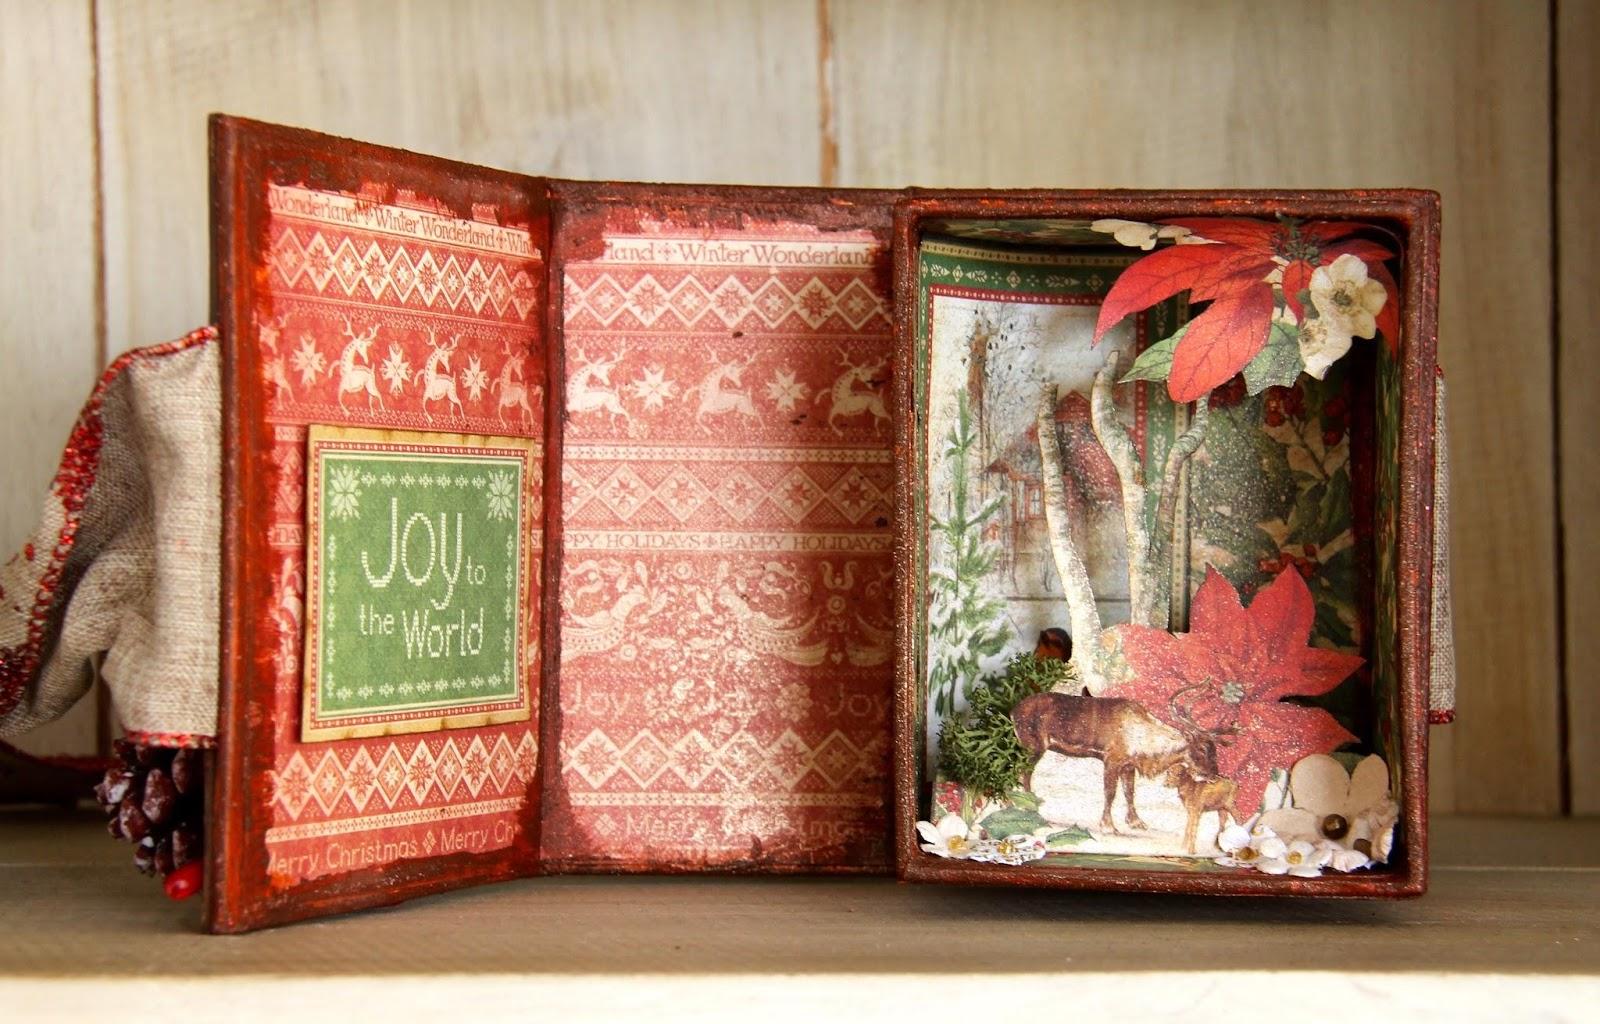 Winter Wonderland Book Box by Marina Blaukitchen Product by Graphic 45 photo 4.jpg